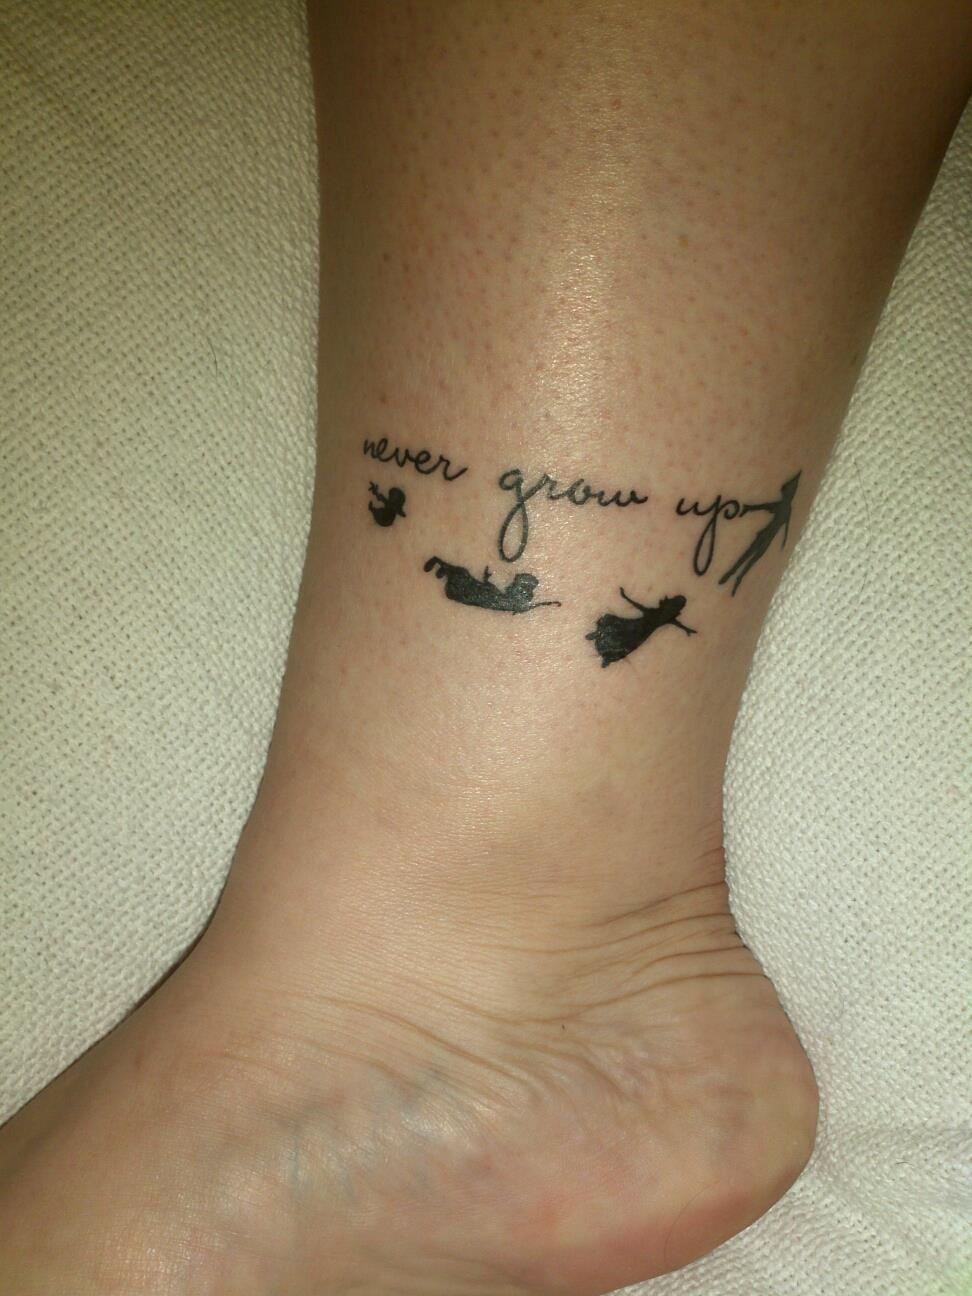 Dp Maternity Blue Bodycon Dress Peter Pan Tattoo Tattoos Cute Tattoos For Women